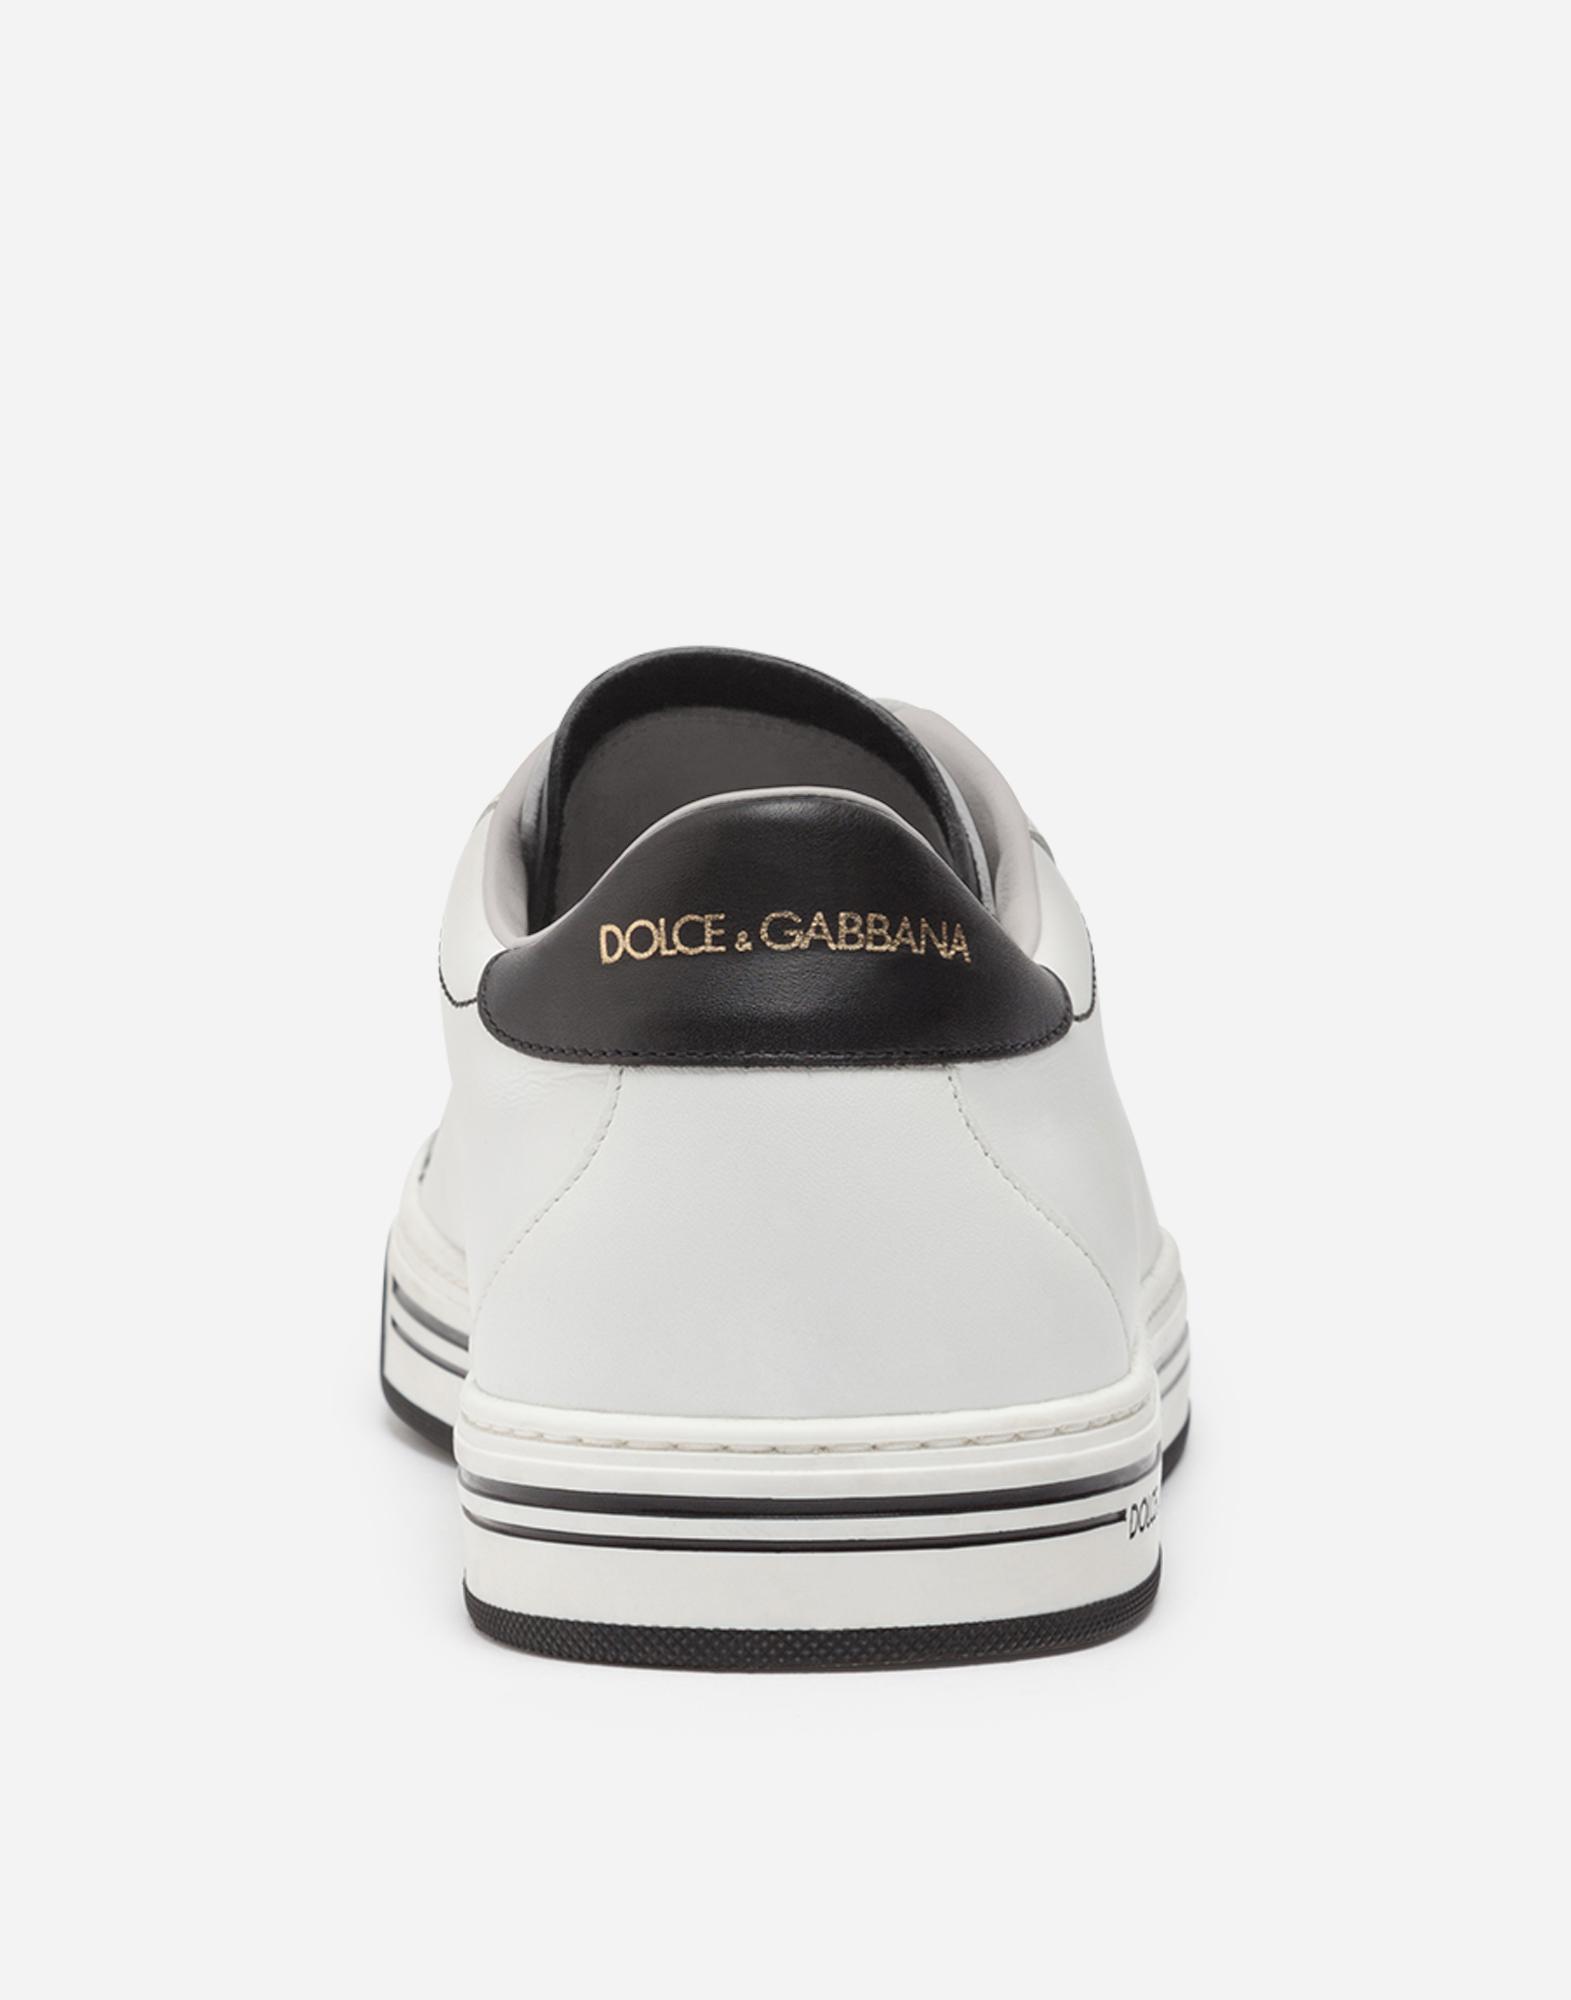 Dolce & Gabbana ROMA SNEAKERS IN NAPPA CALFSKIN